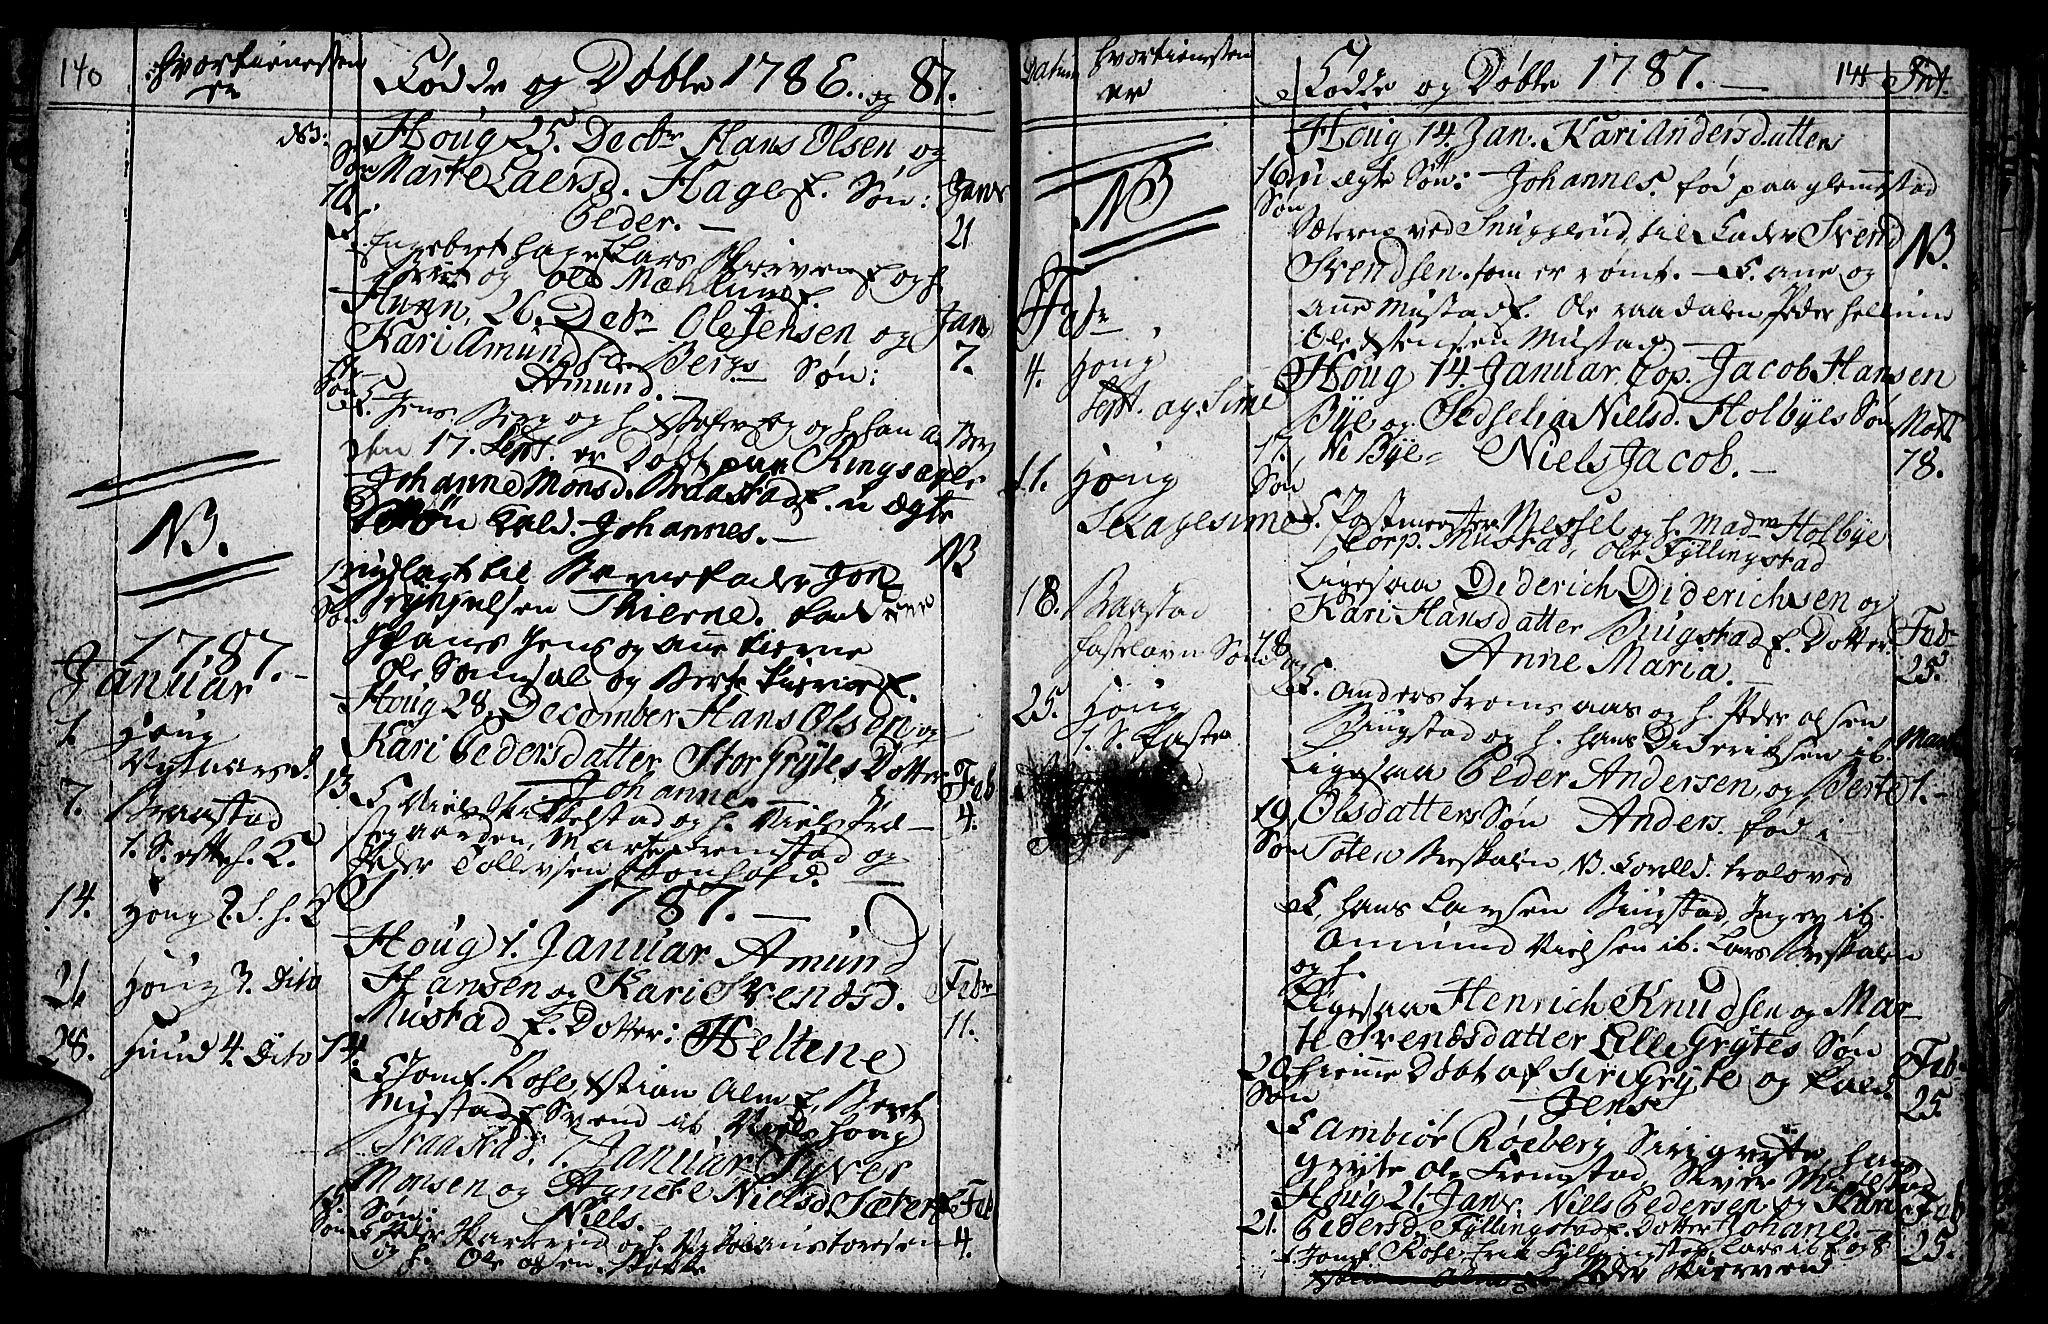 SAH, Vardal prestekontor, H/Ha/Hab/L0001: Klokkerbok nr. 1, 1771-1790, s. 140-141